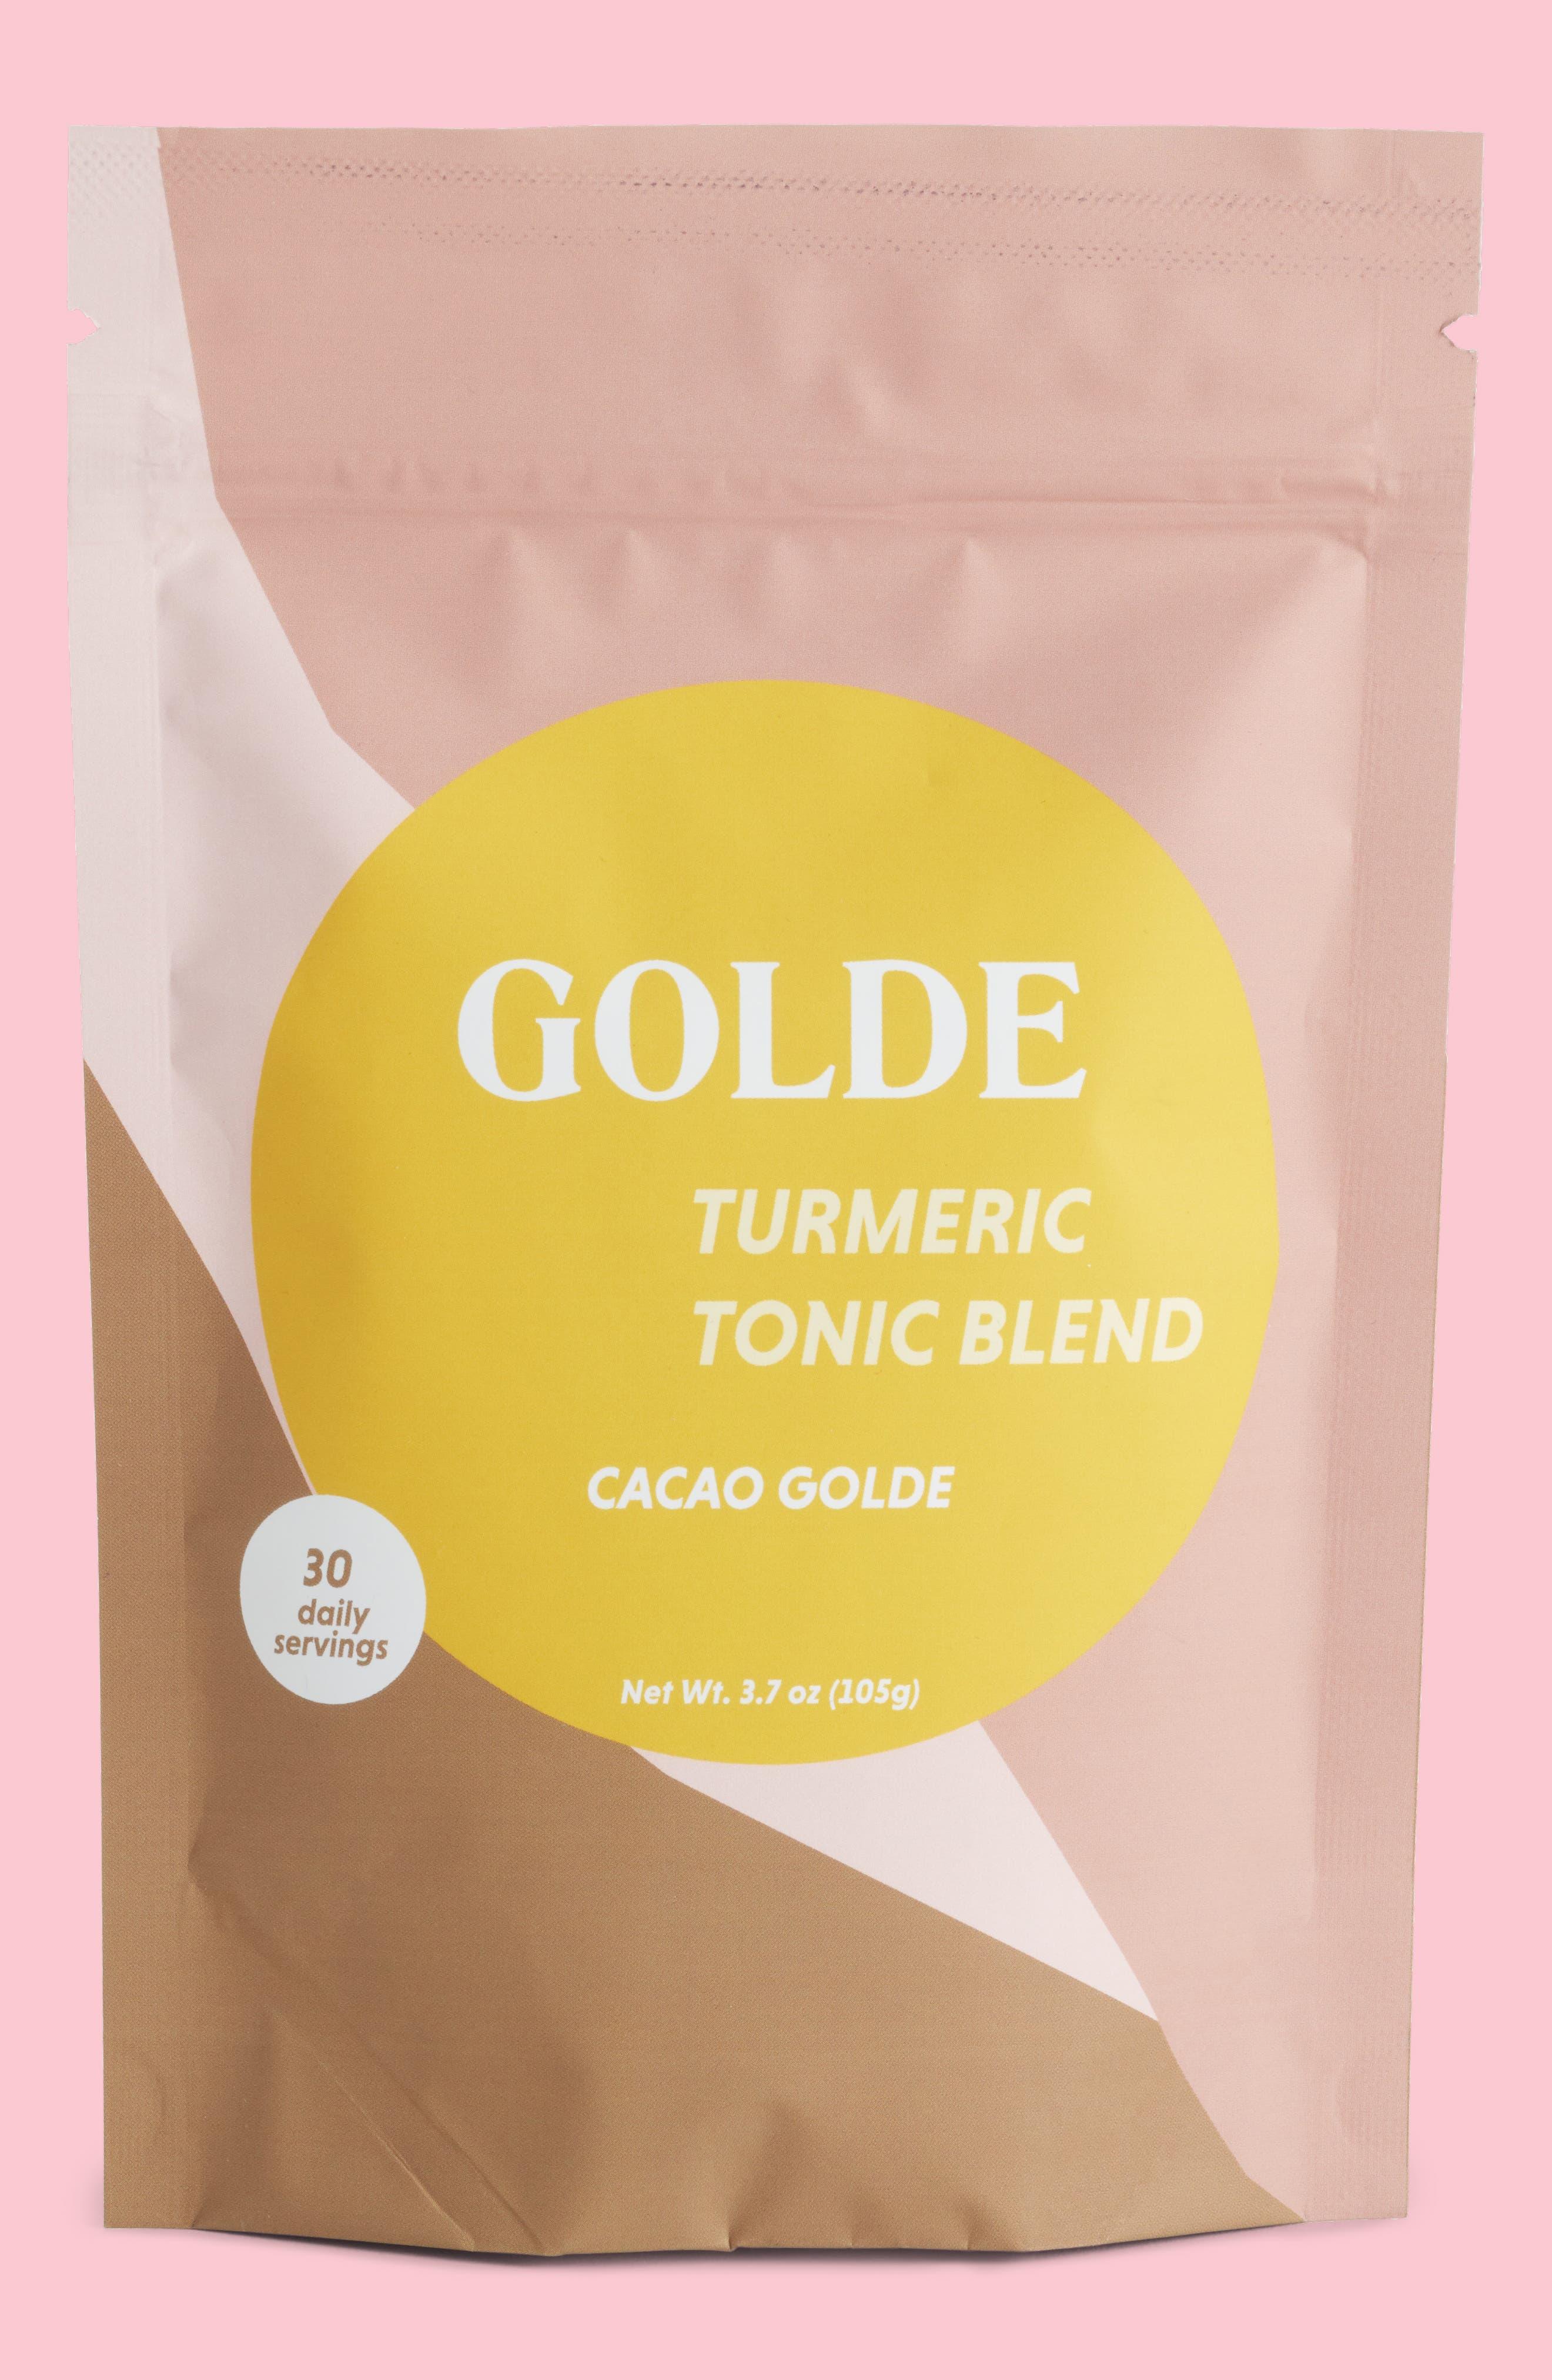 Golde Cacao Golde Turmeric Tonic Blend,                         Main,                         color, 000